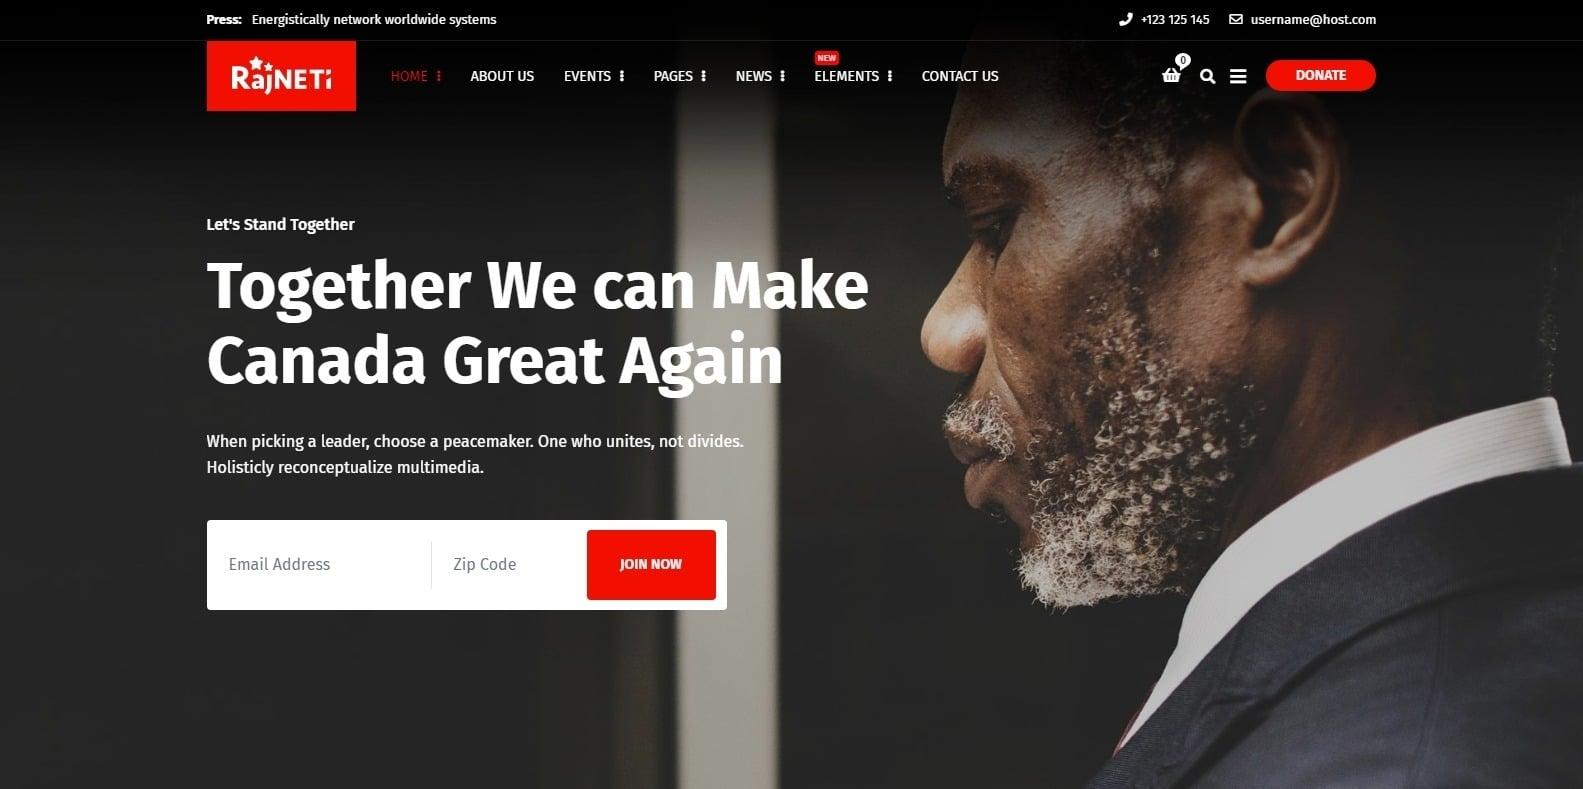 rajneti-political-website-template